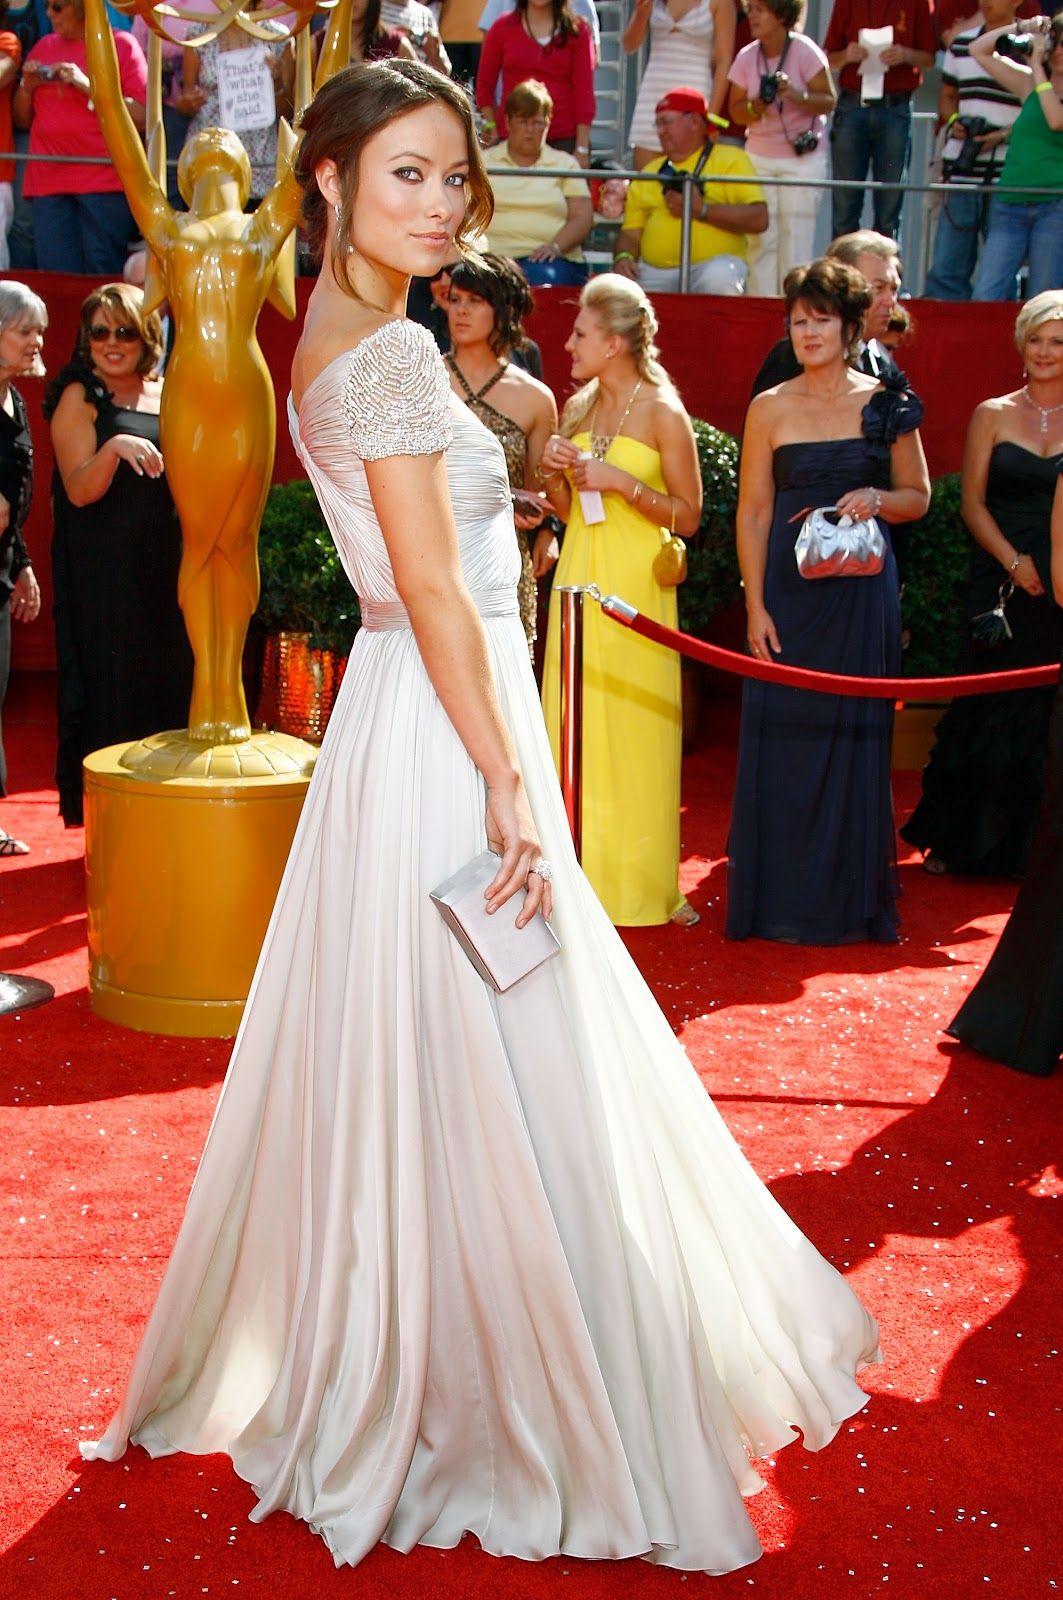 Elie Saab Olivia Wilde Dress Google Search Celebrity Dresses Chiffon Evening Dresses Red Carpet Dresses [ 1600 x 1063 Pixel ]